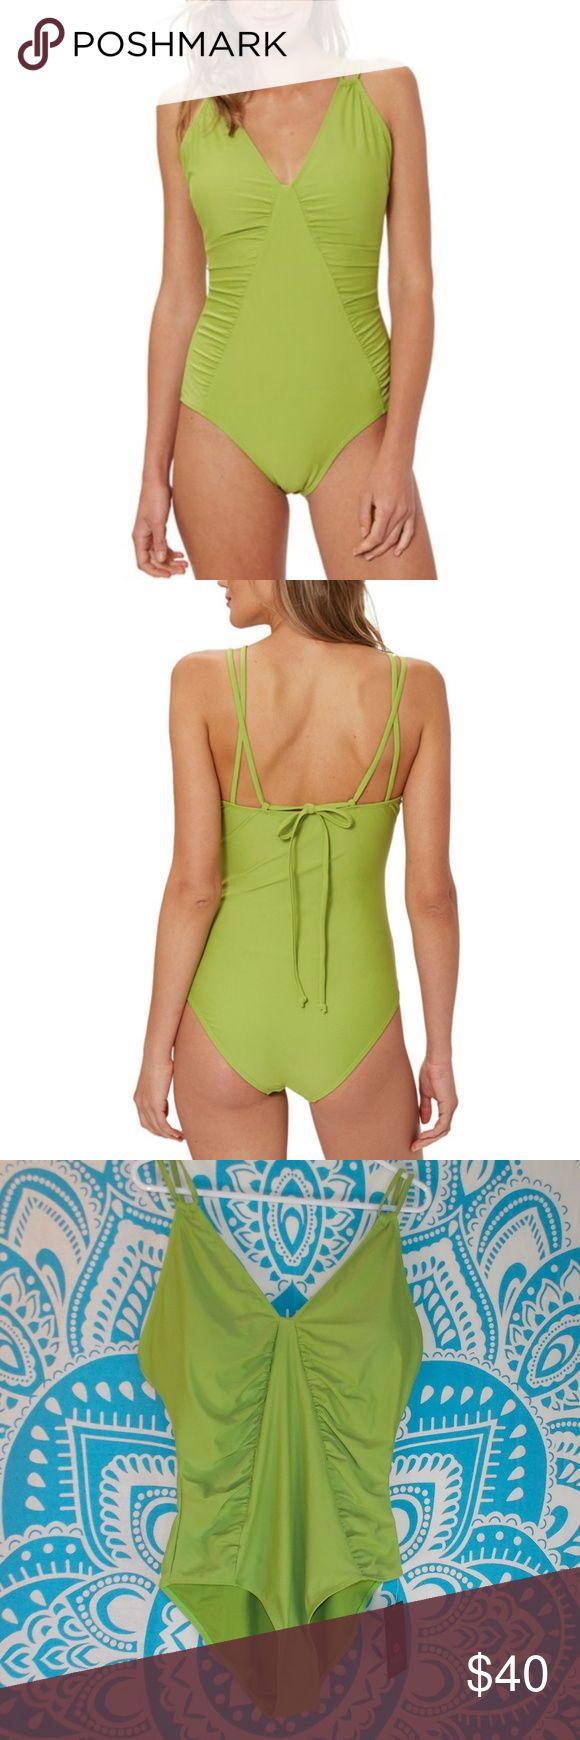 Marilyn Monroe XL Ruched One Piece Swimsuit Swim Brand: Marilyn Monroe Size: XL …